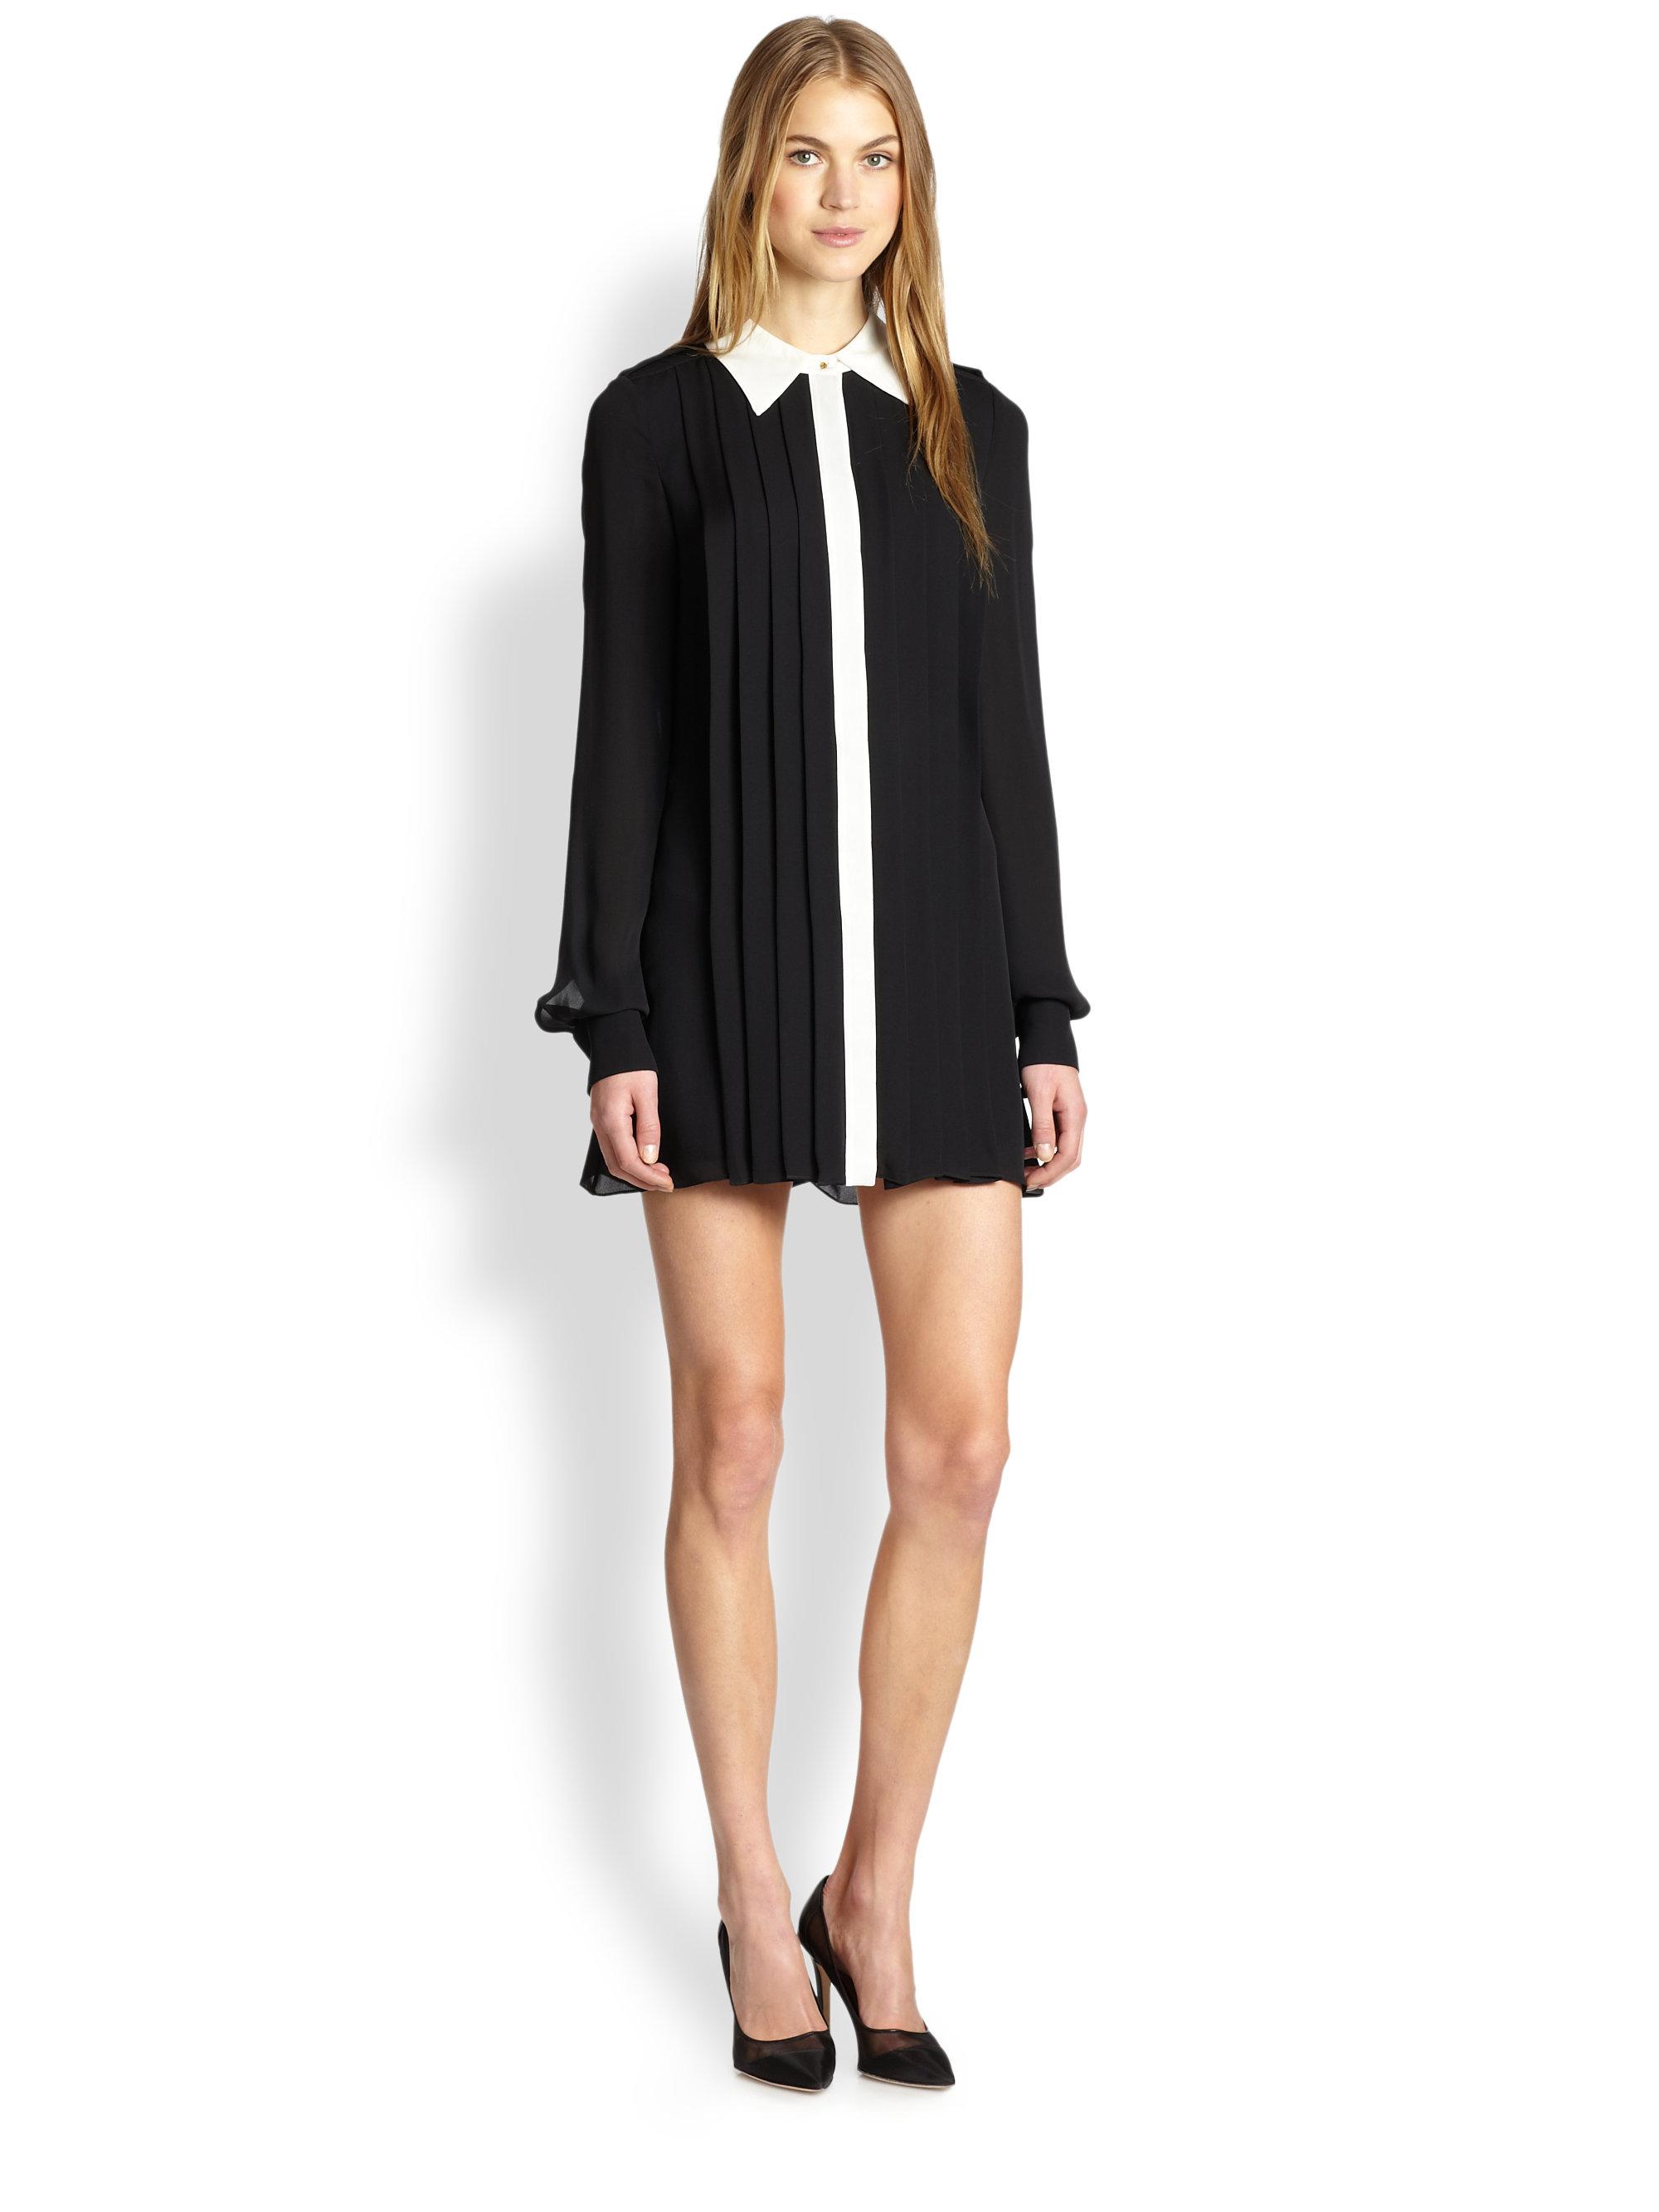 Rachel zoe laurel silk chiffon pleated shirt dress in for Black pleated dress shirt